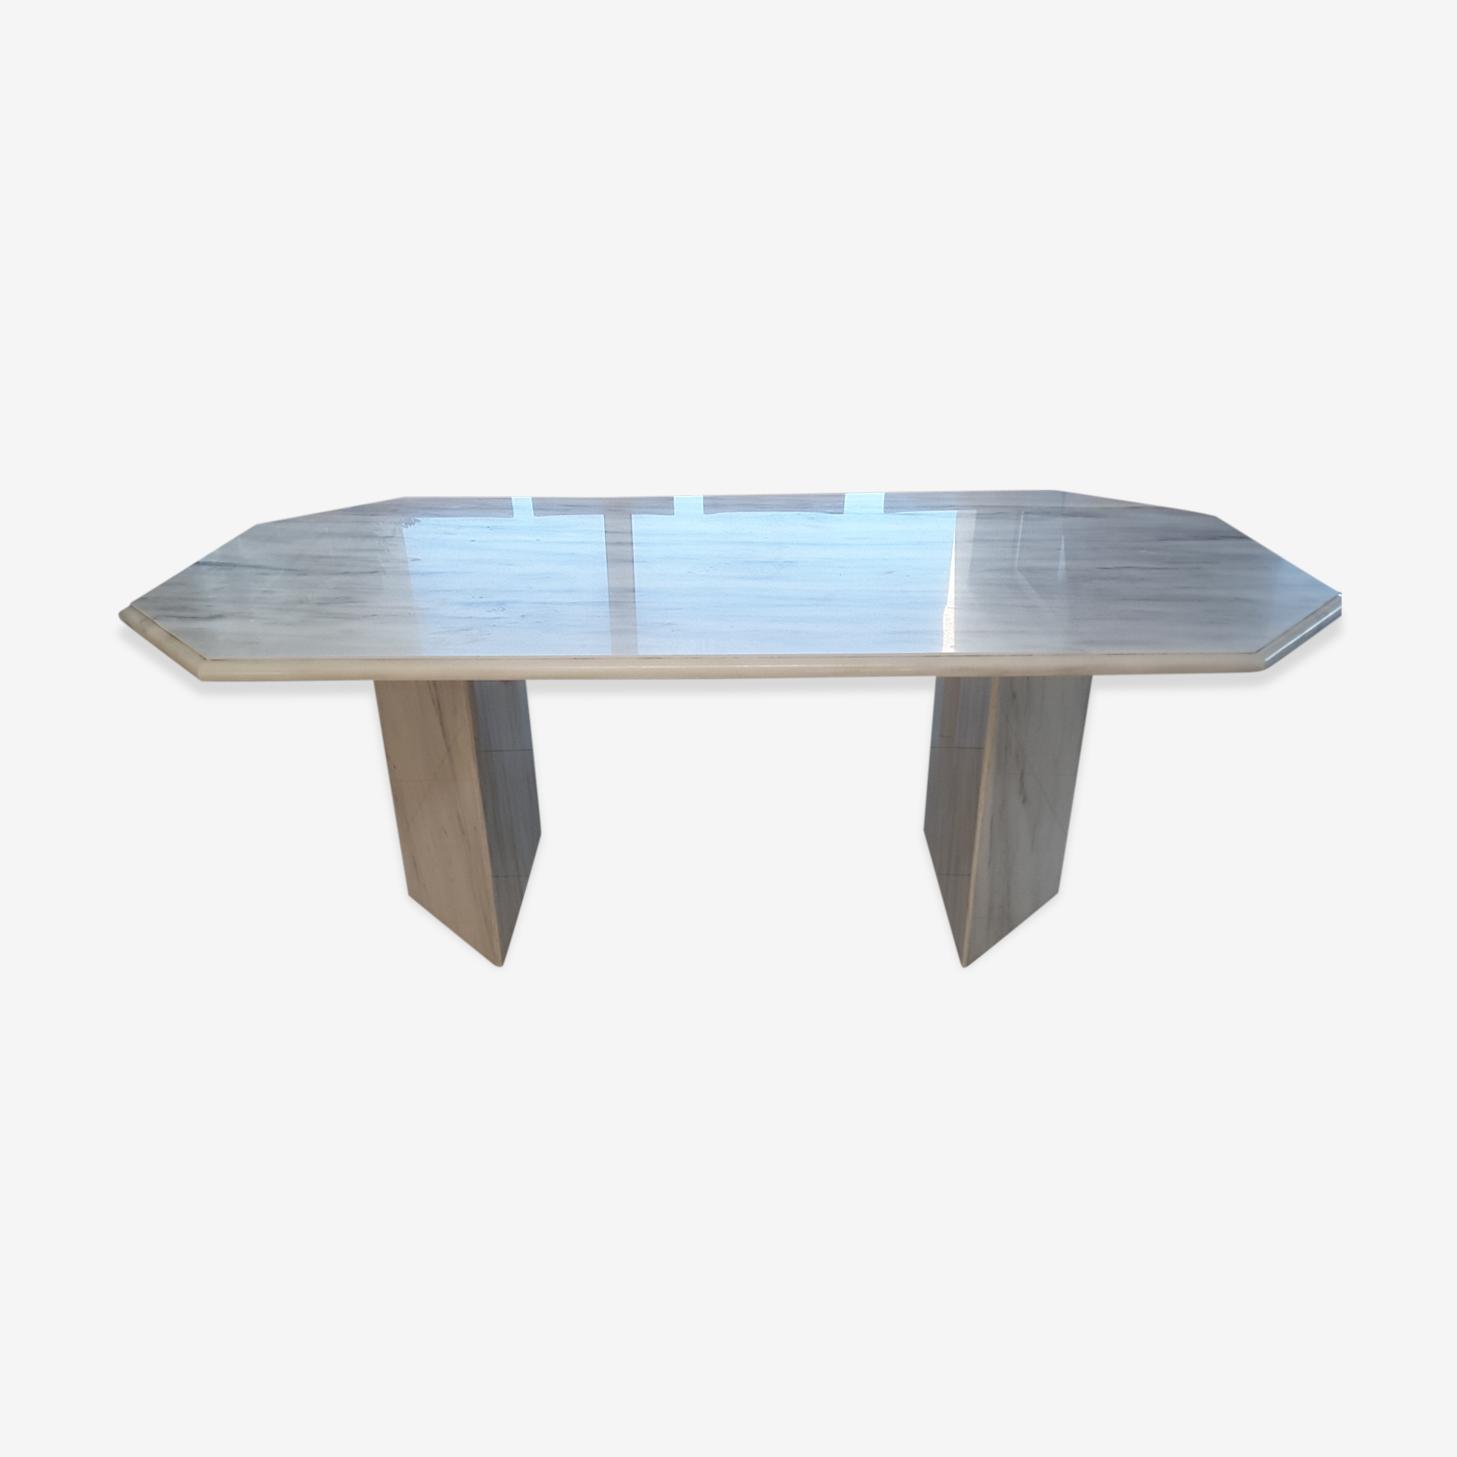 Carrara marble table